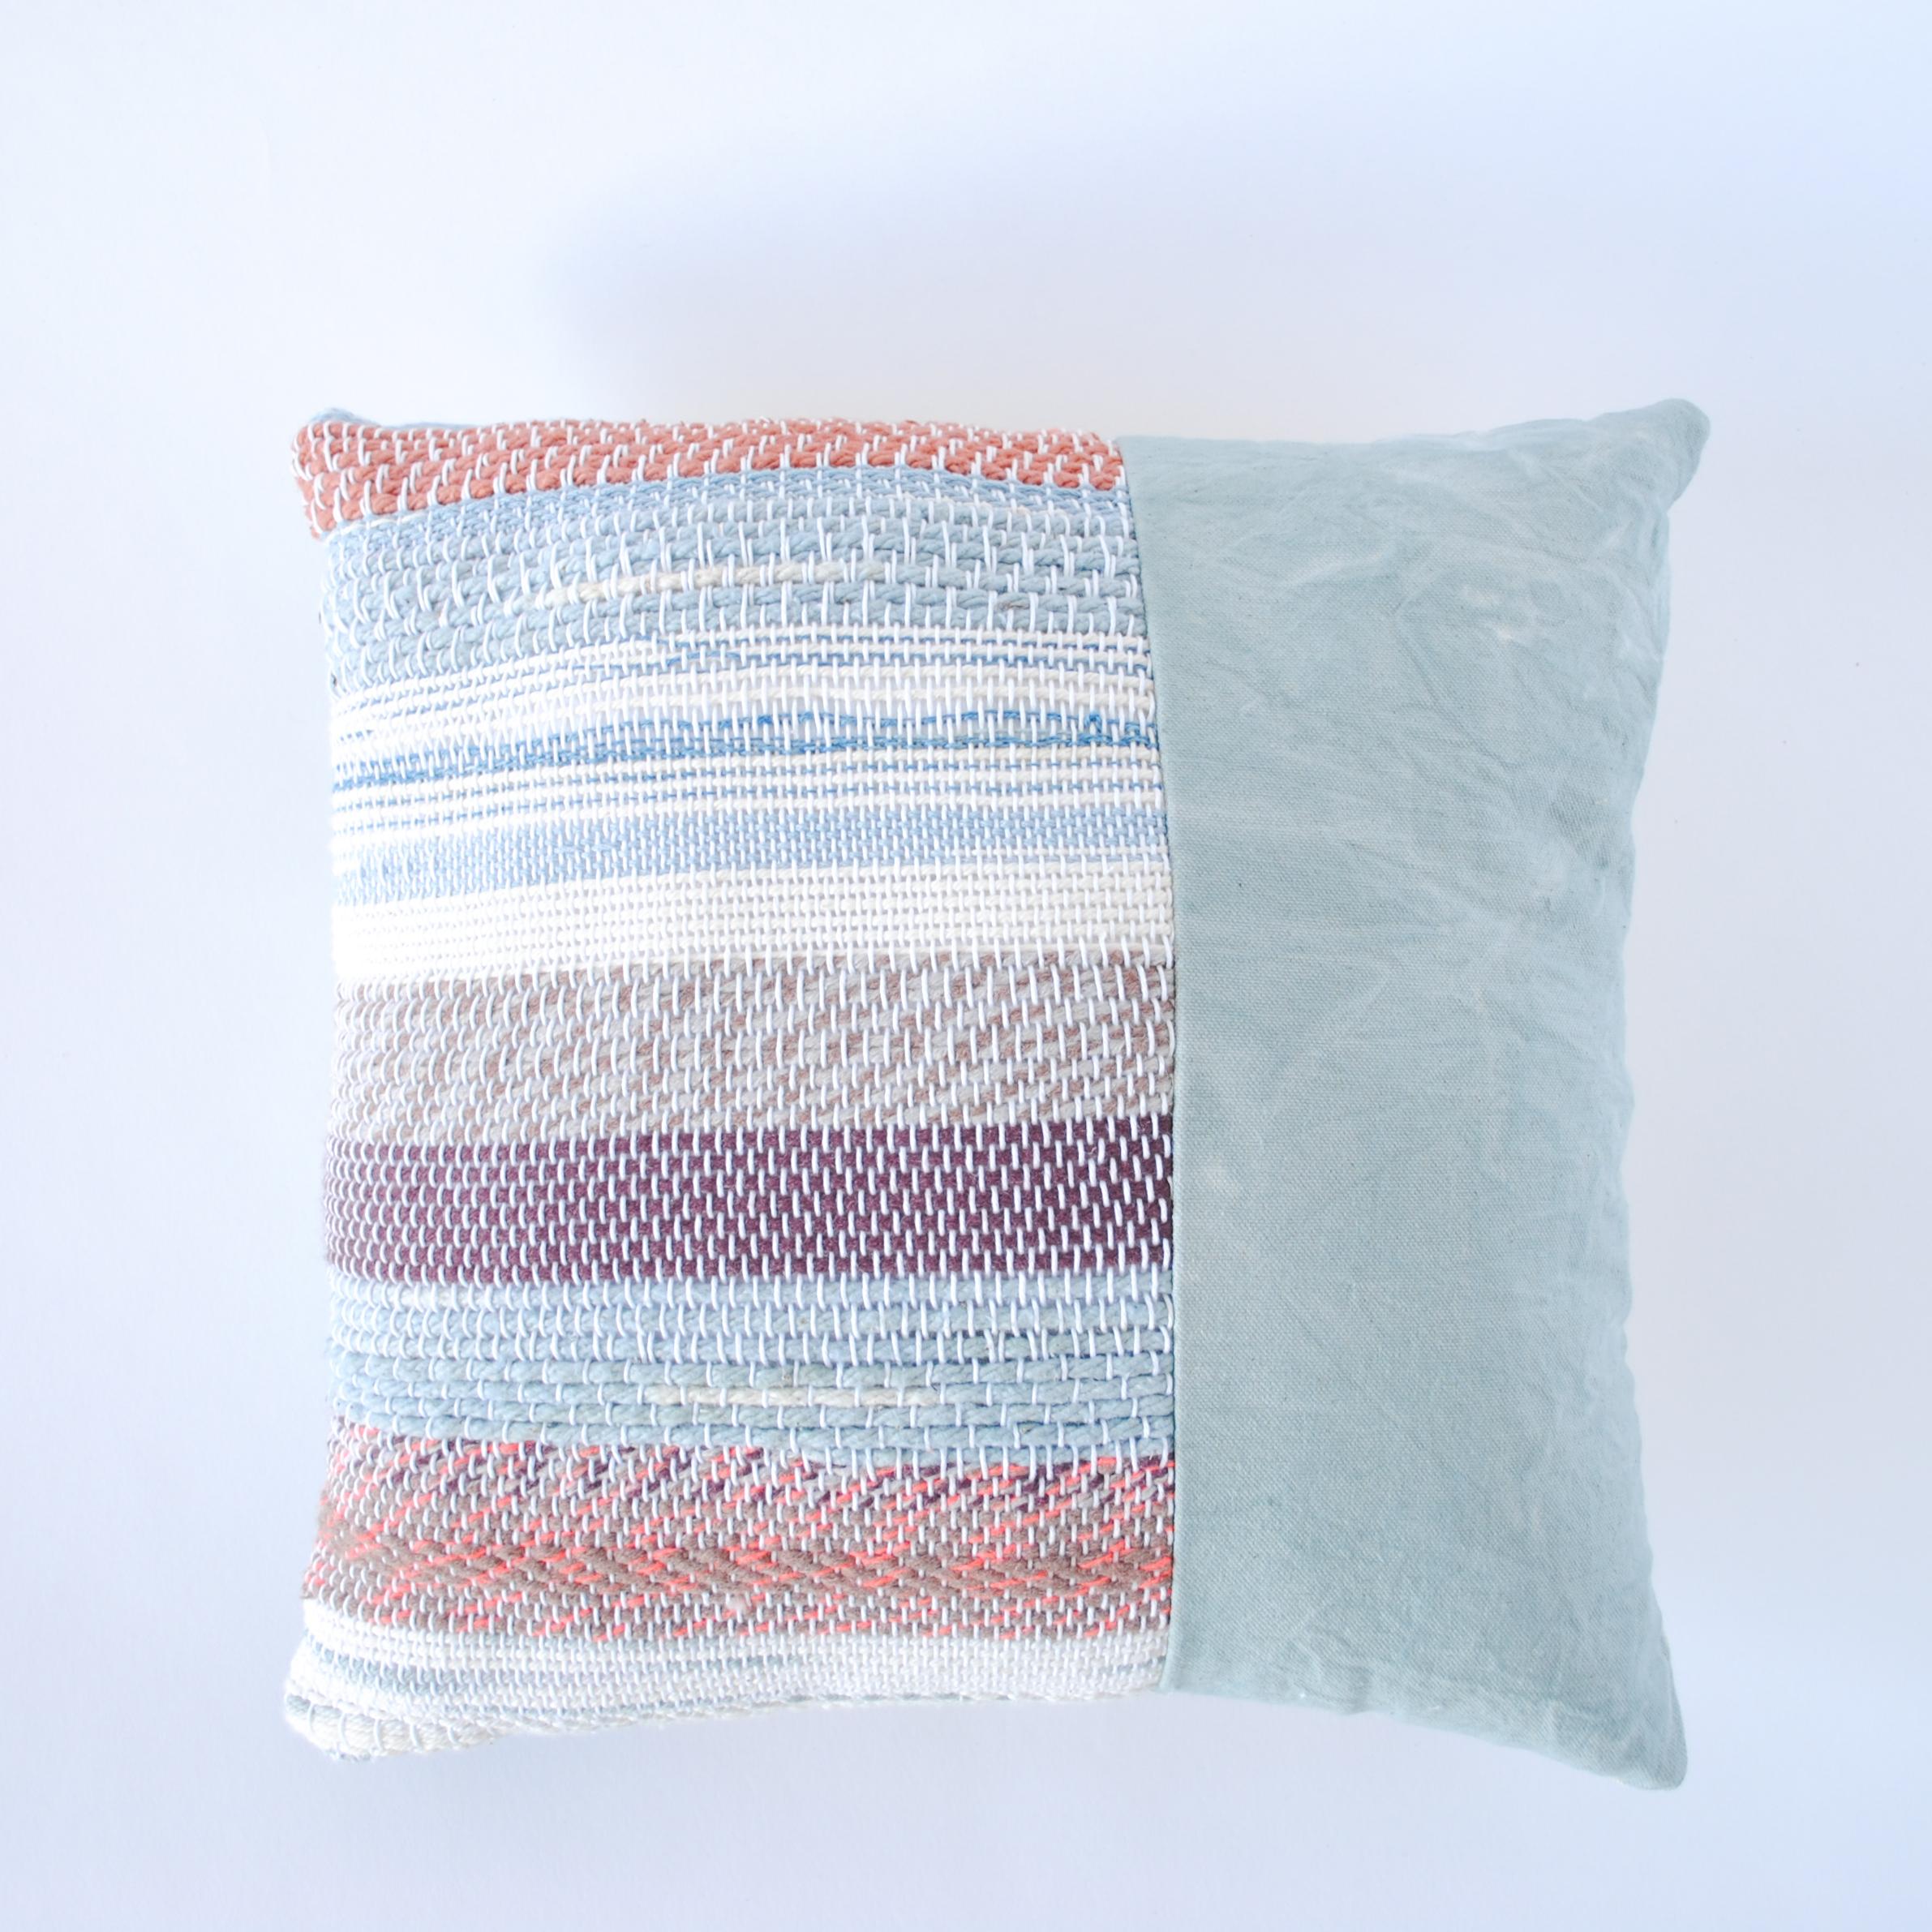 WEGATHER_CommunityCloth_Handwoven_Pillow_Large.JPG